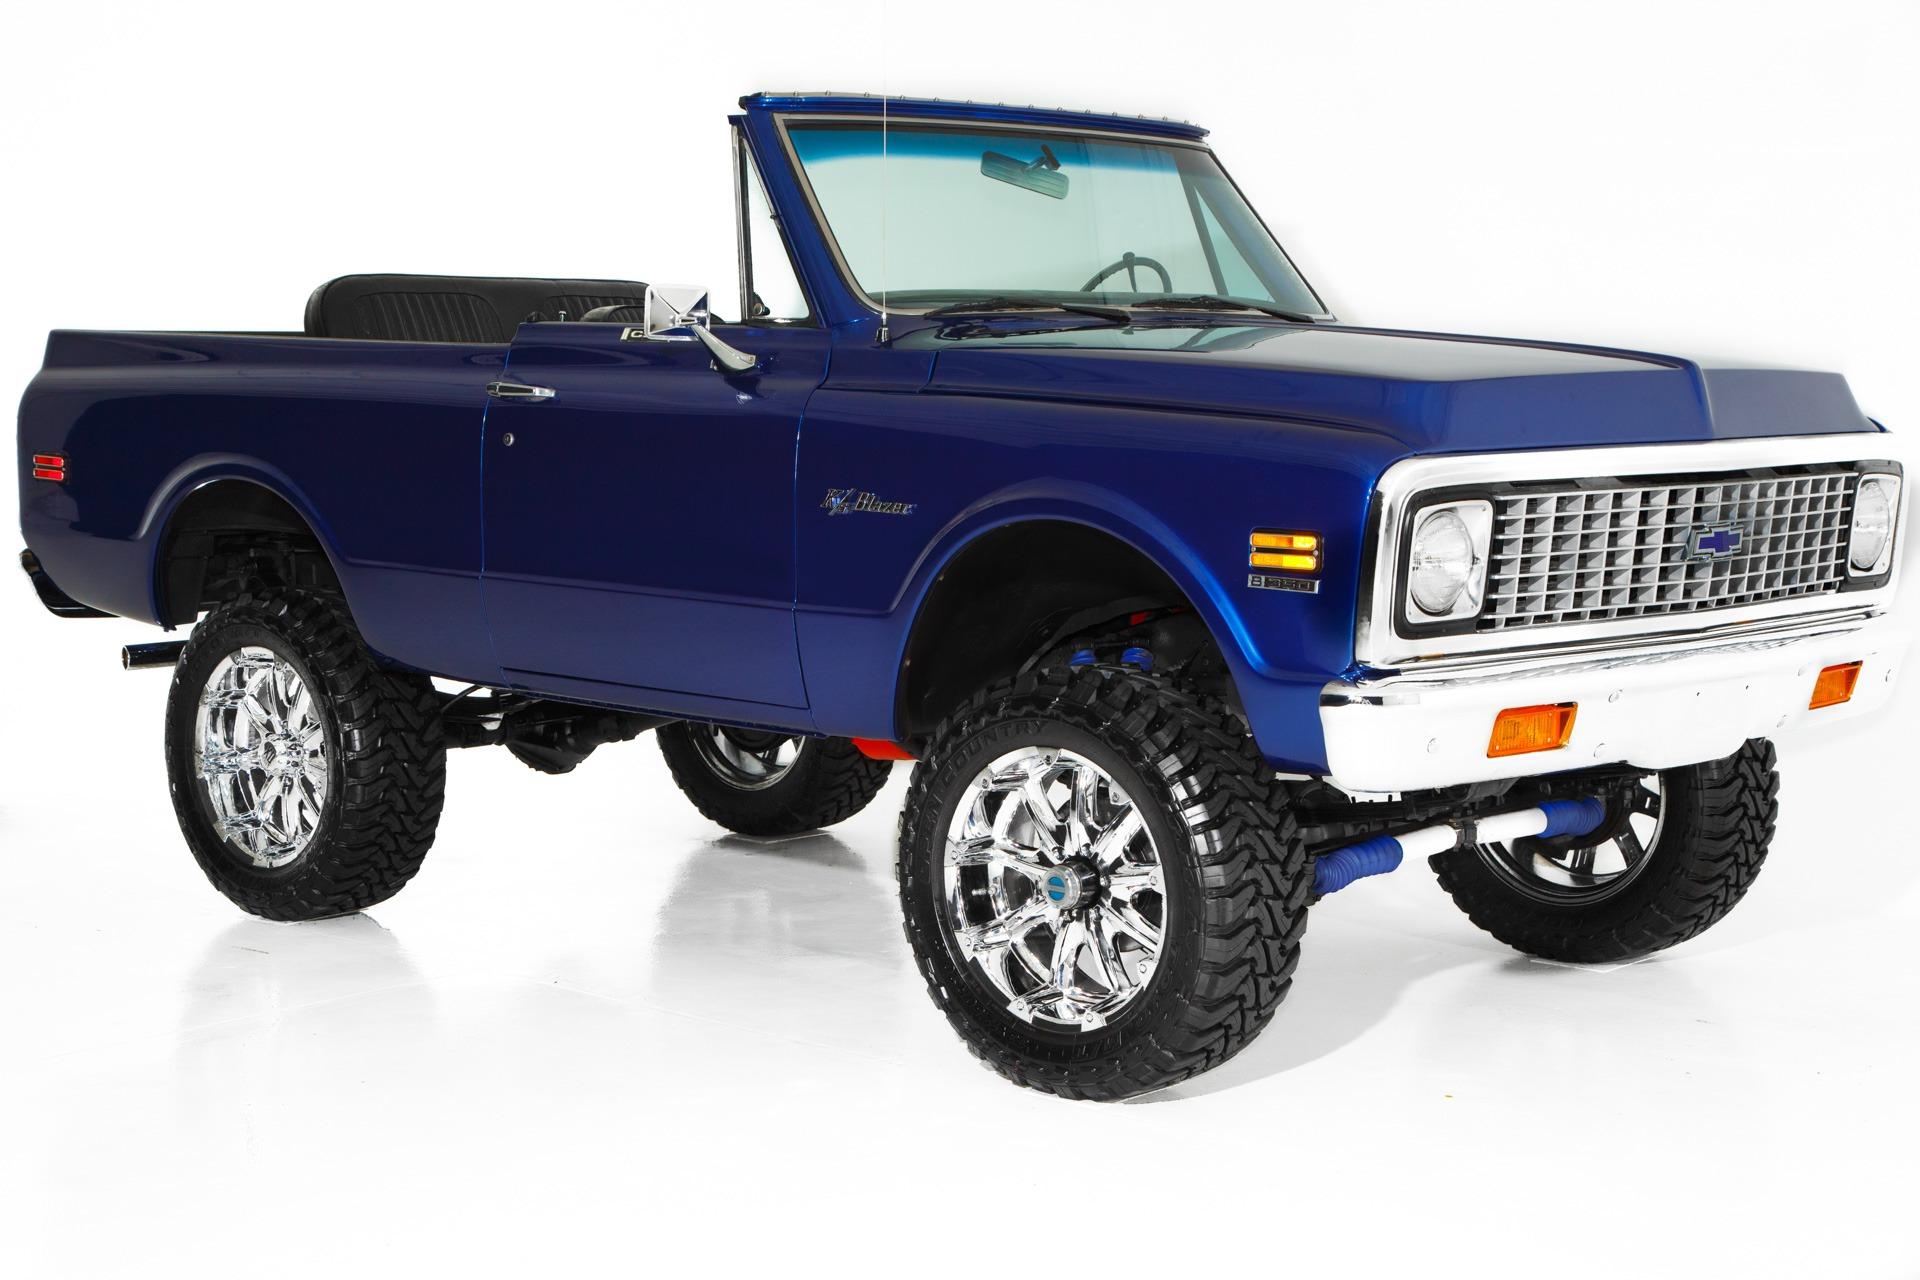 Photo 1972 Chevrolet Blazer Blue Metallic 383 Soft top